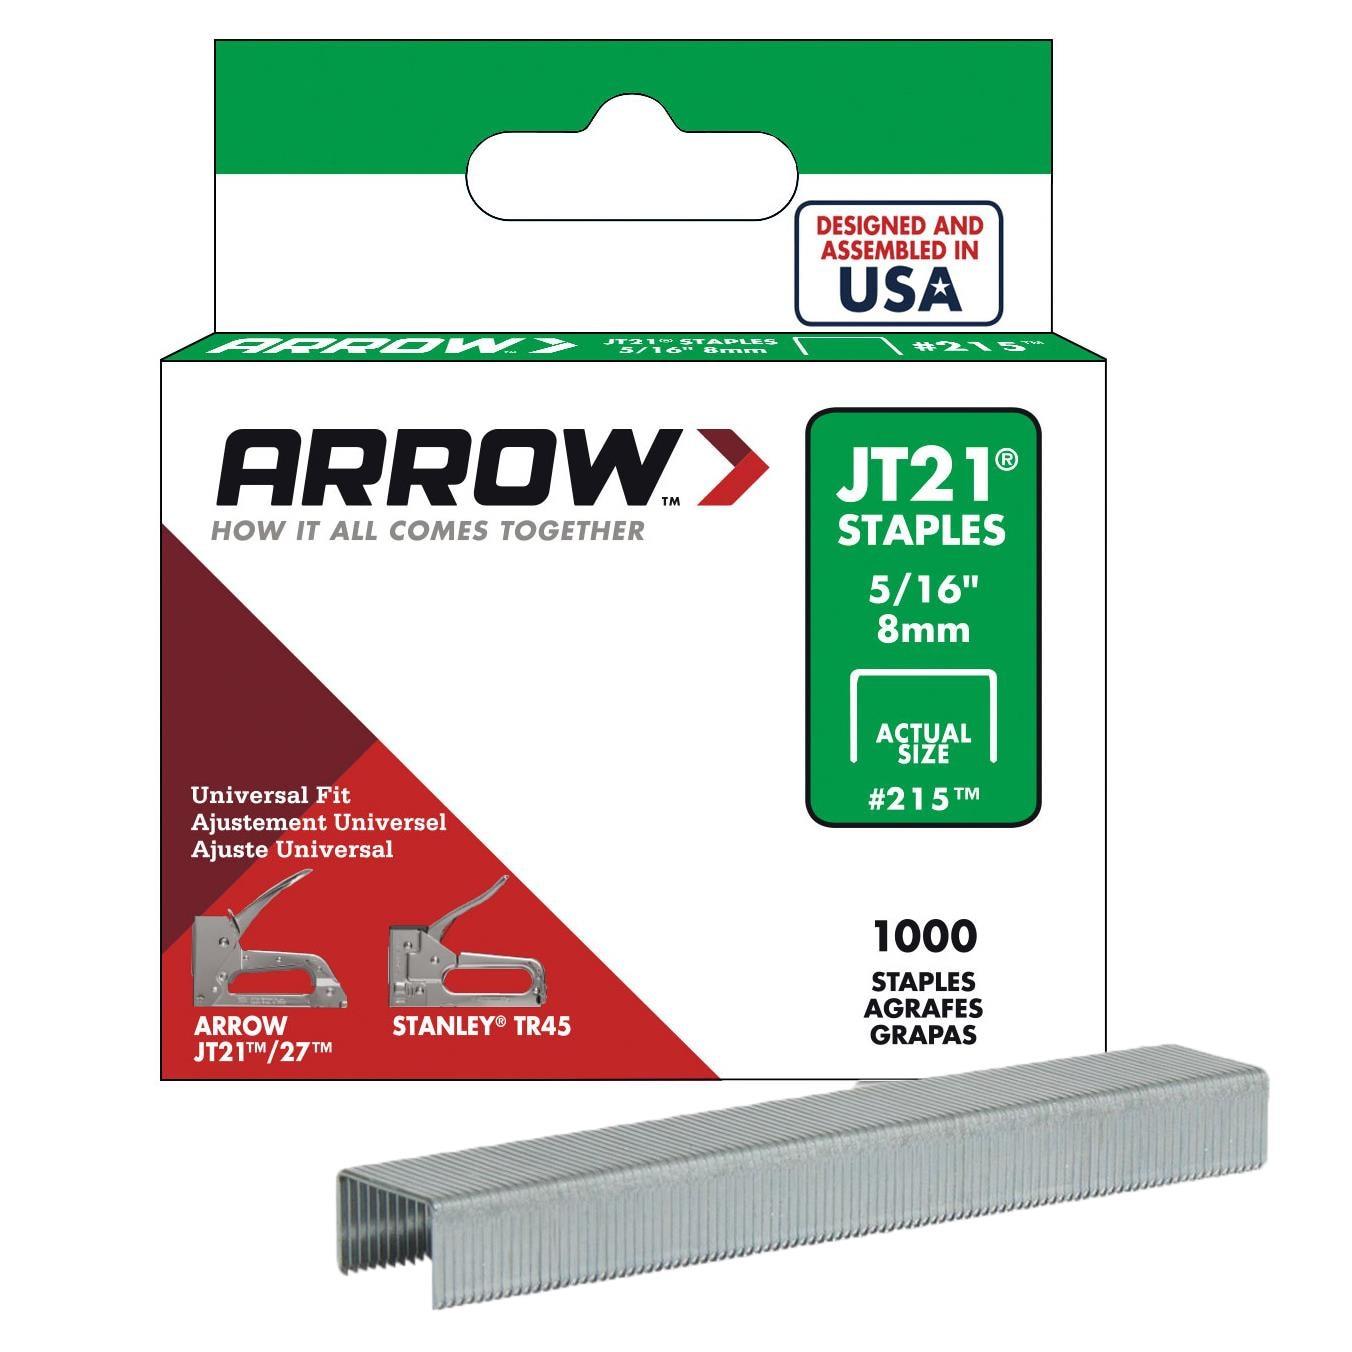 Arrow AR215 8mm 1000 PCs Professional Staple Wire